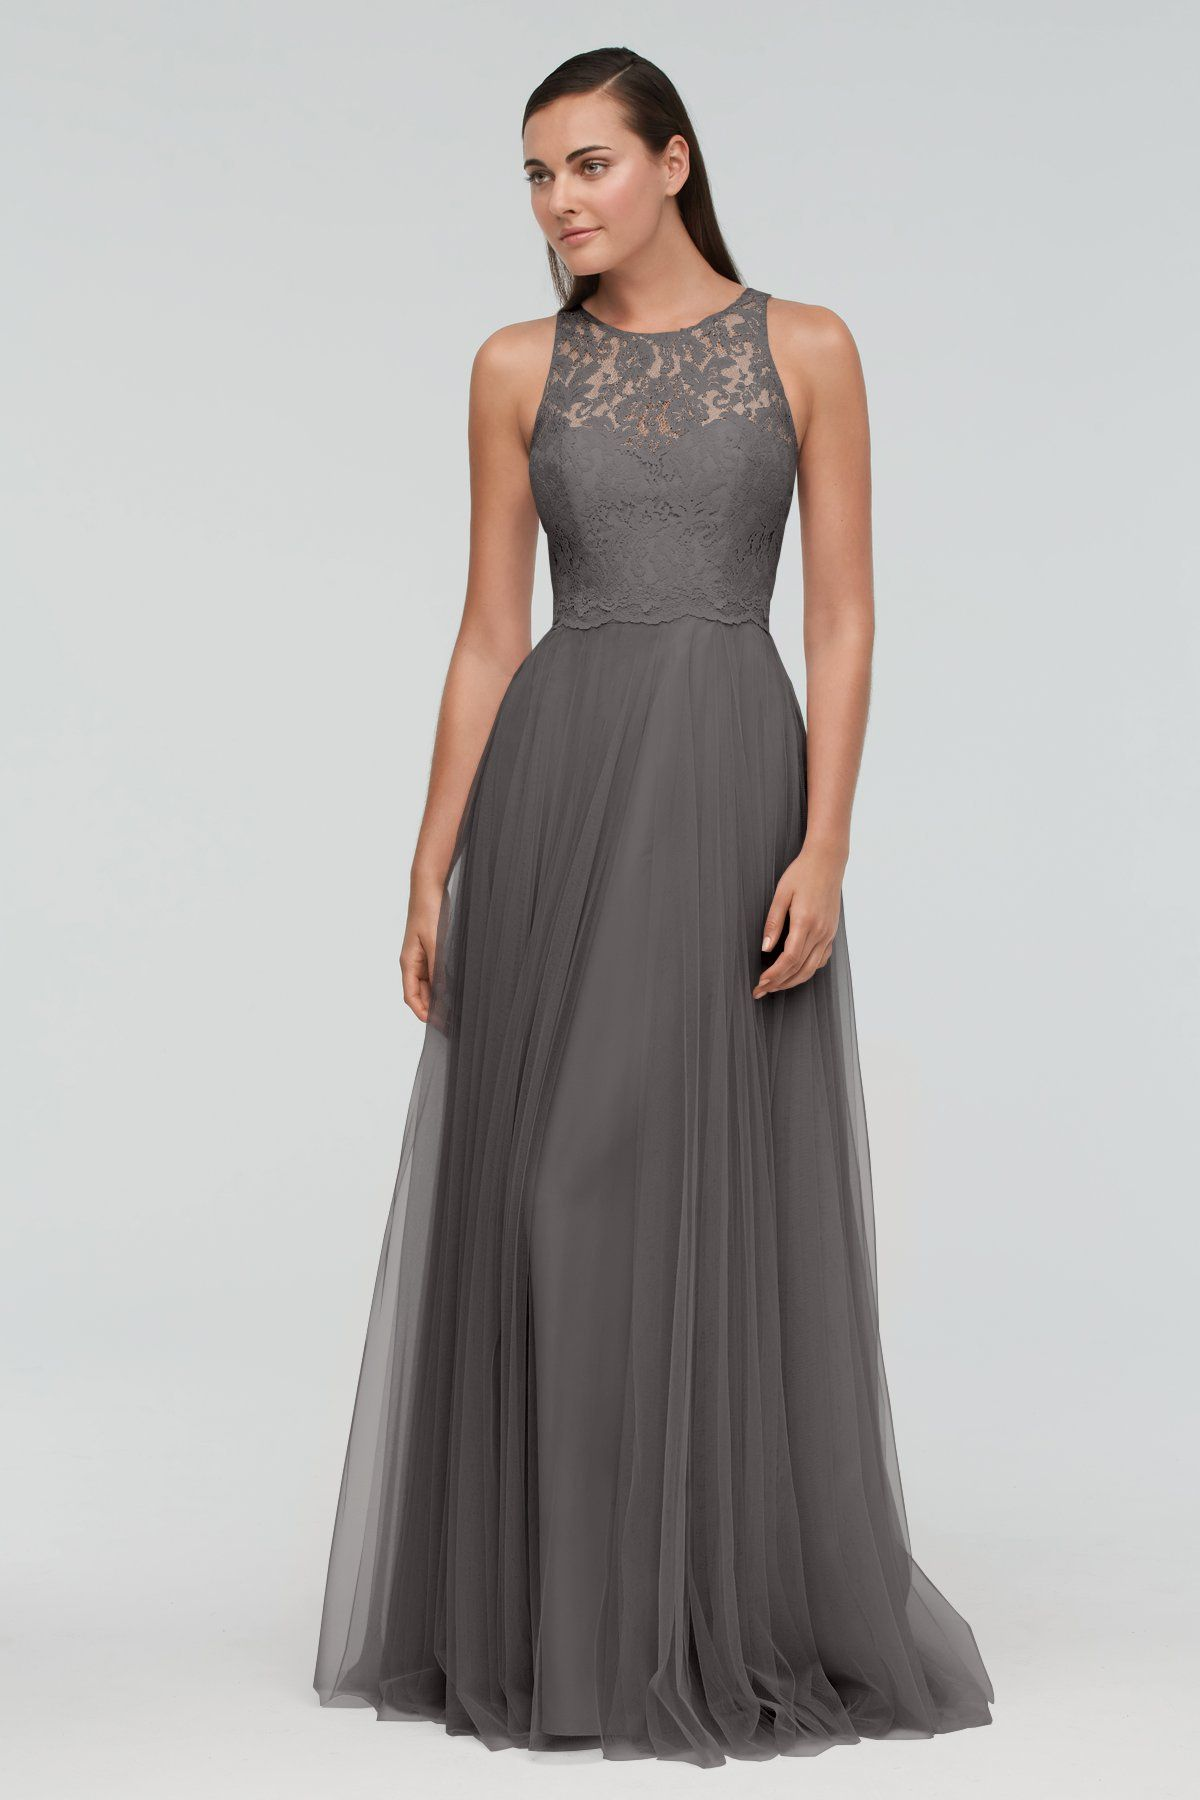 d07dc2919a2a Watters Maids Dress Jenny | Bridesmaid | Maid dress, Bridesmaid ...